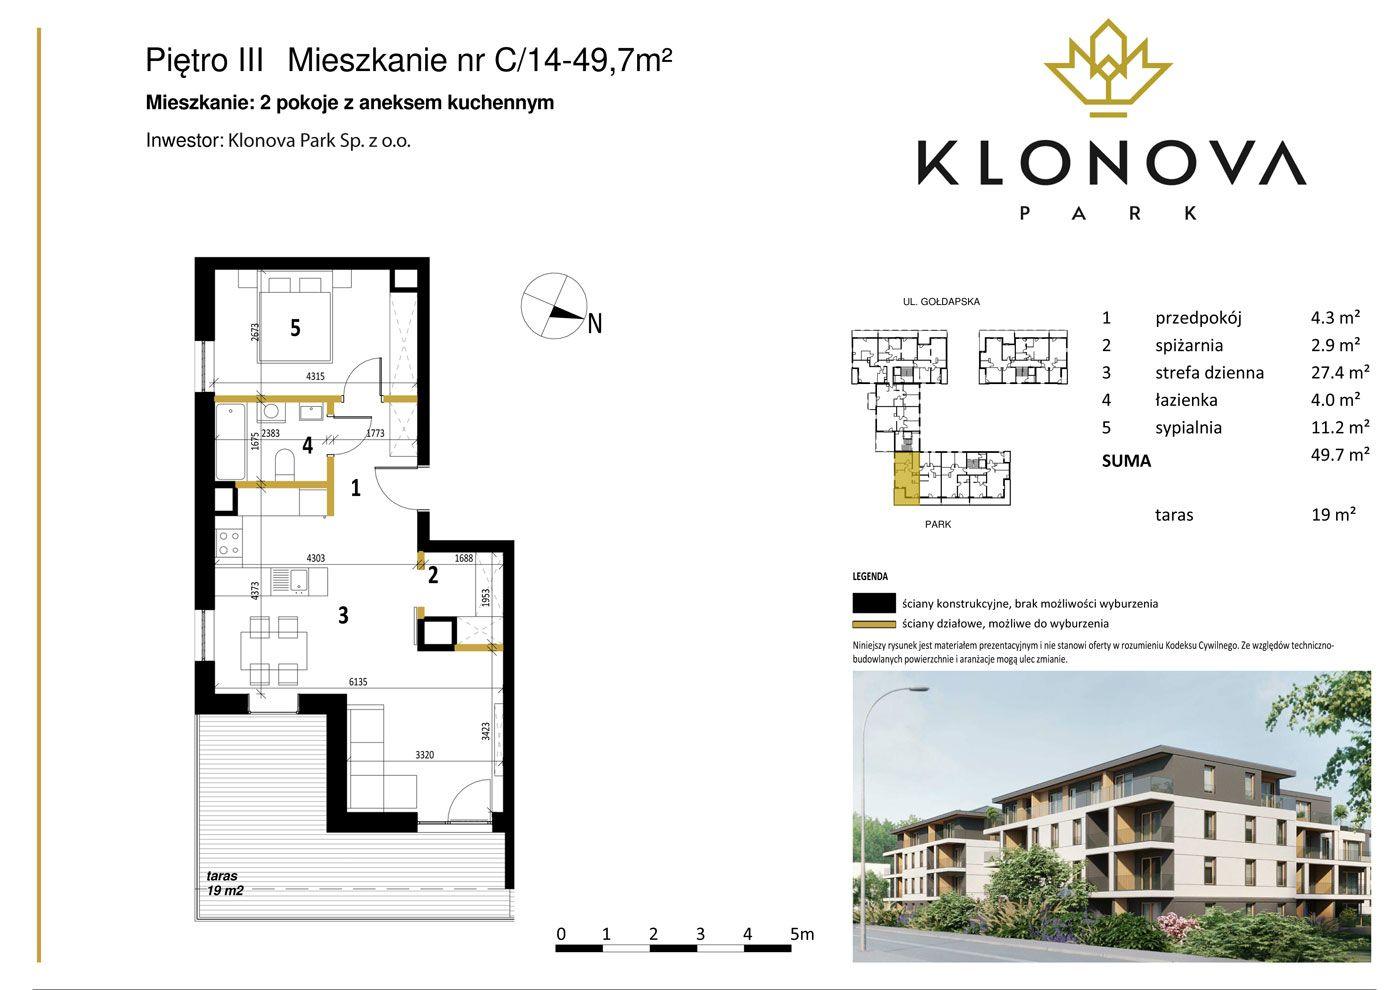 Apartamenty Klonova Park - Plan mieszkania C/14